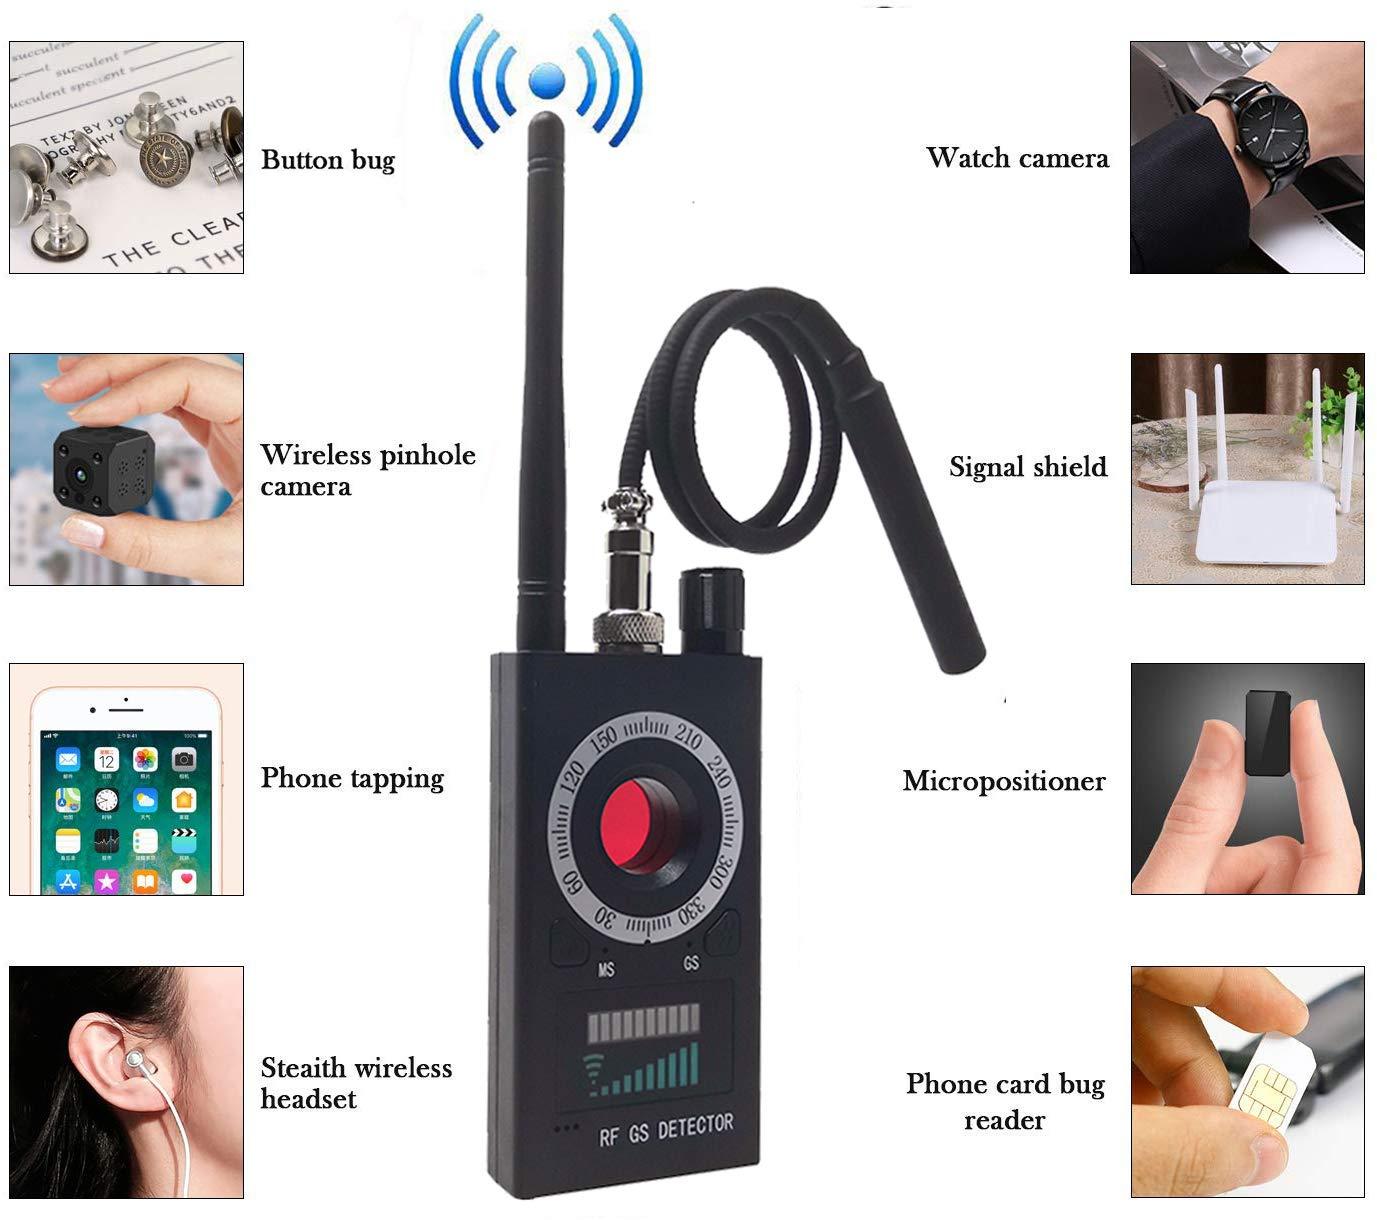 FEAYEA Anti Spy RF Detector - Camera Detector - Wireless Bug Detector Signal - Hidden Camera Detector - GSM Listening Device Finder Radar Radio Scanner by FEAYEA